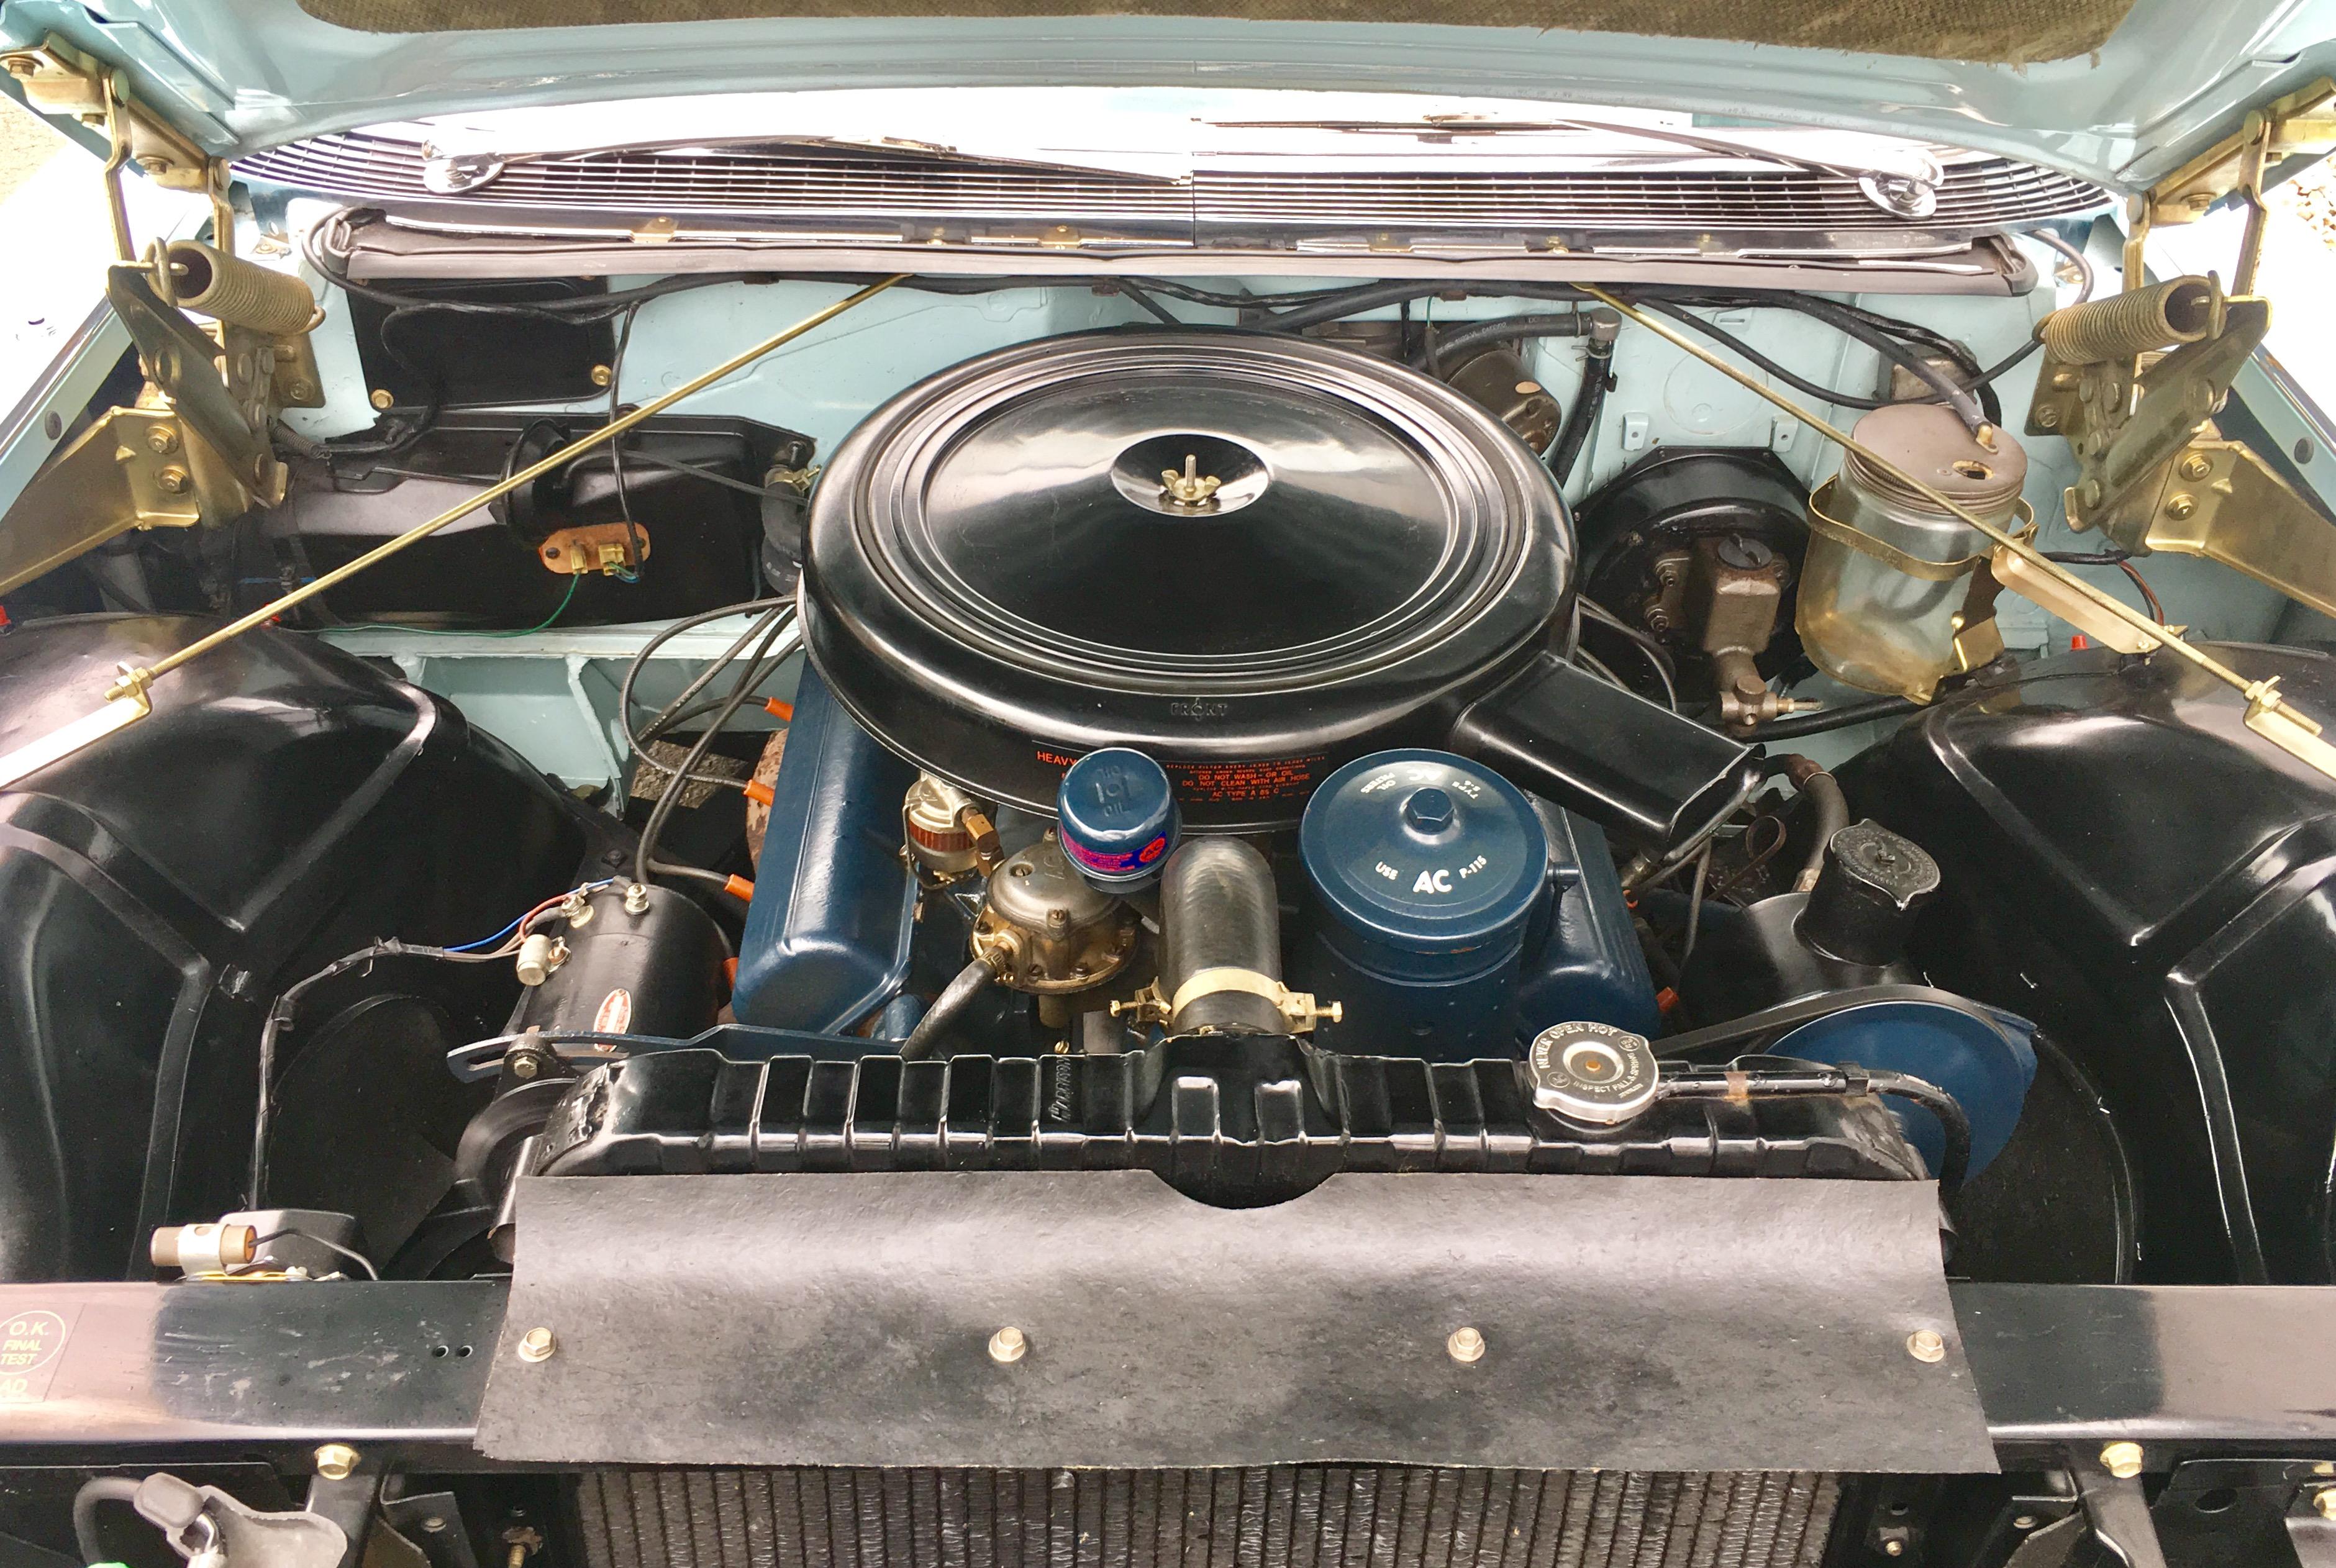 1959 Cadillac 62 Series Cvt